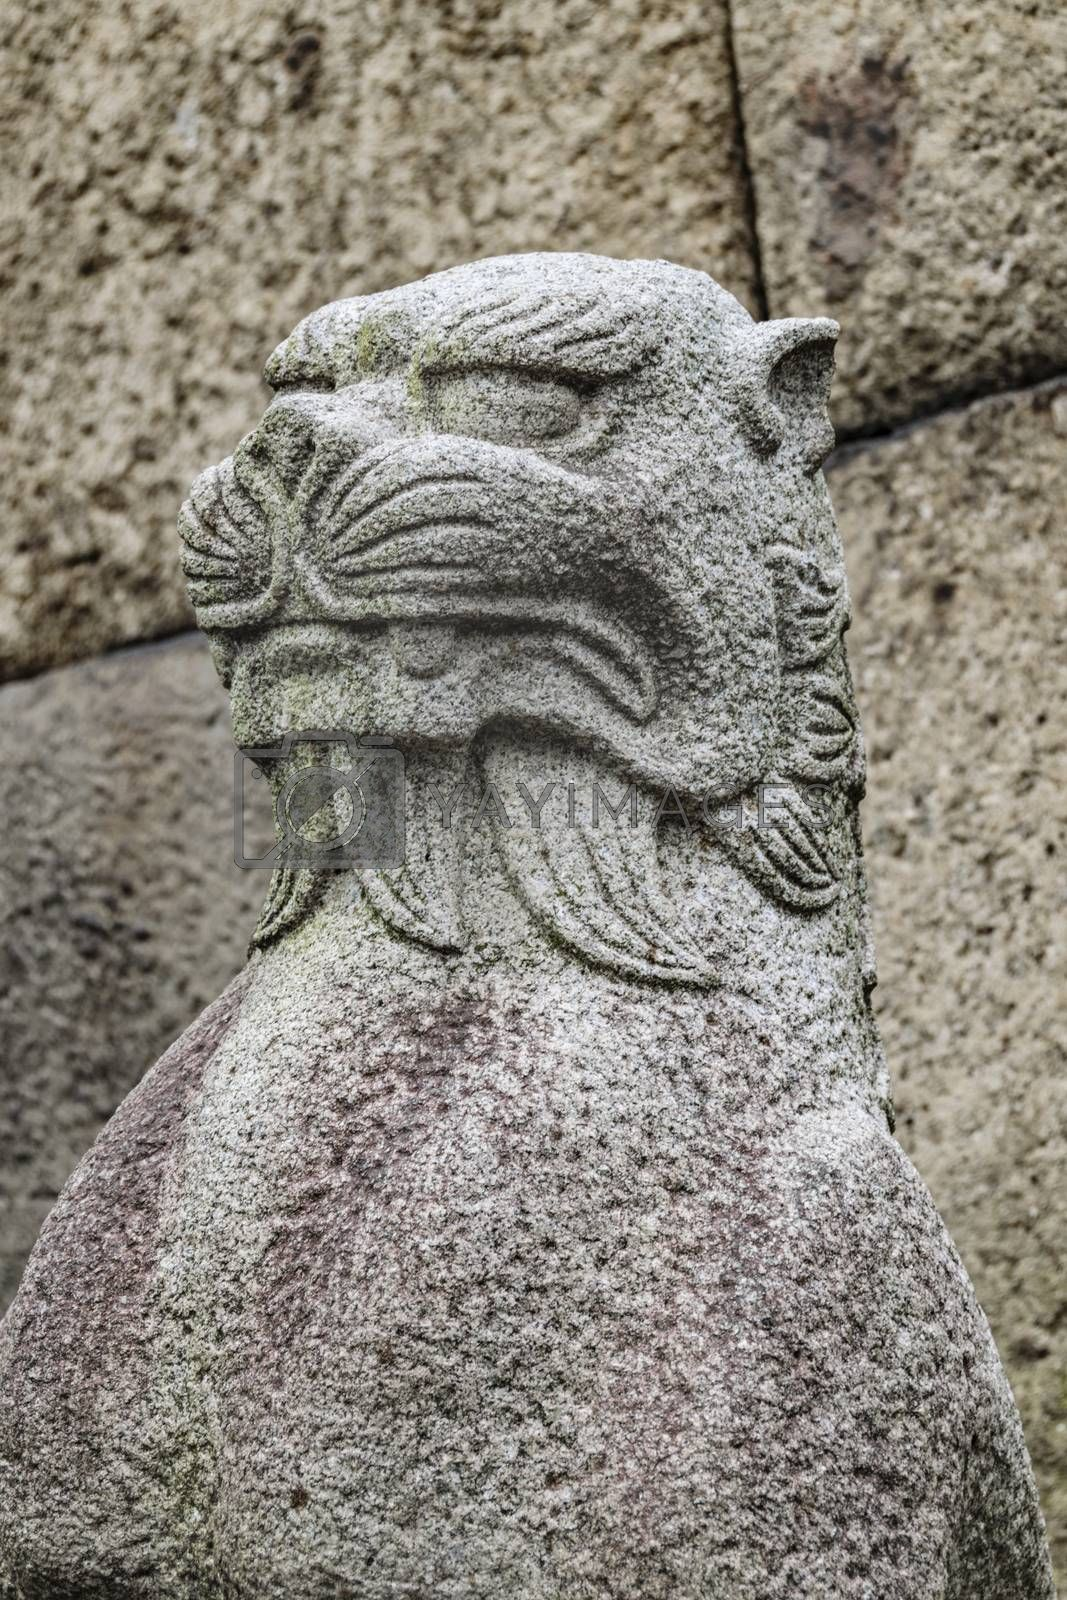 Royalty free image of Japanese Mythological Animal Sculpture, Tokyo Japan by DanFLCreative